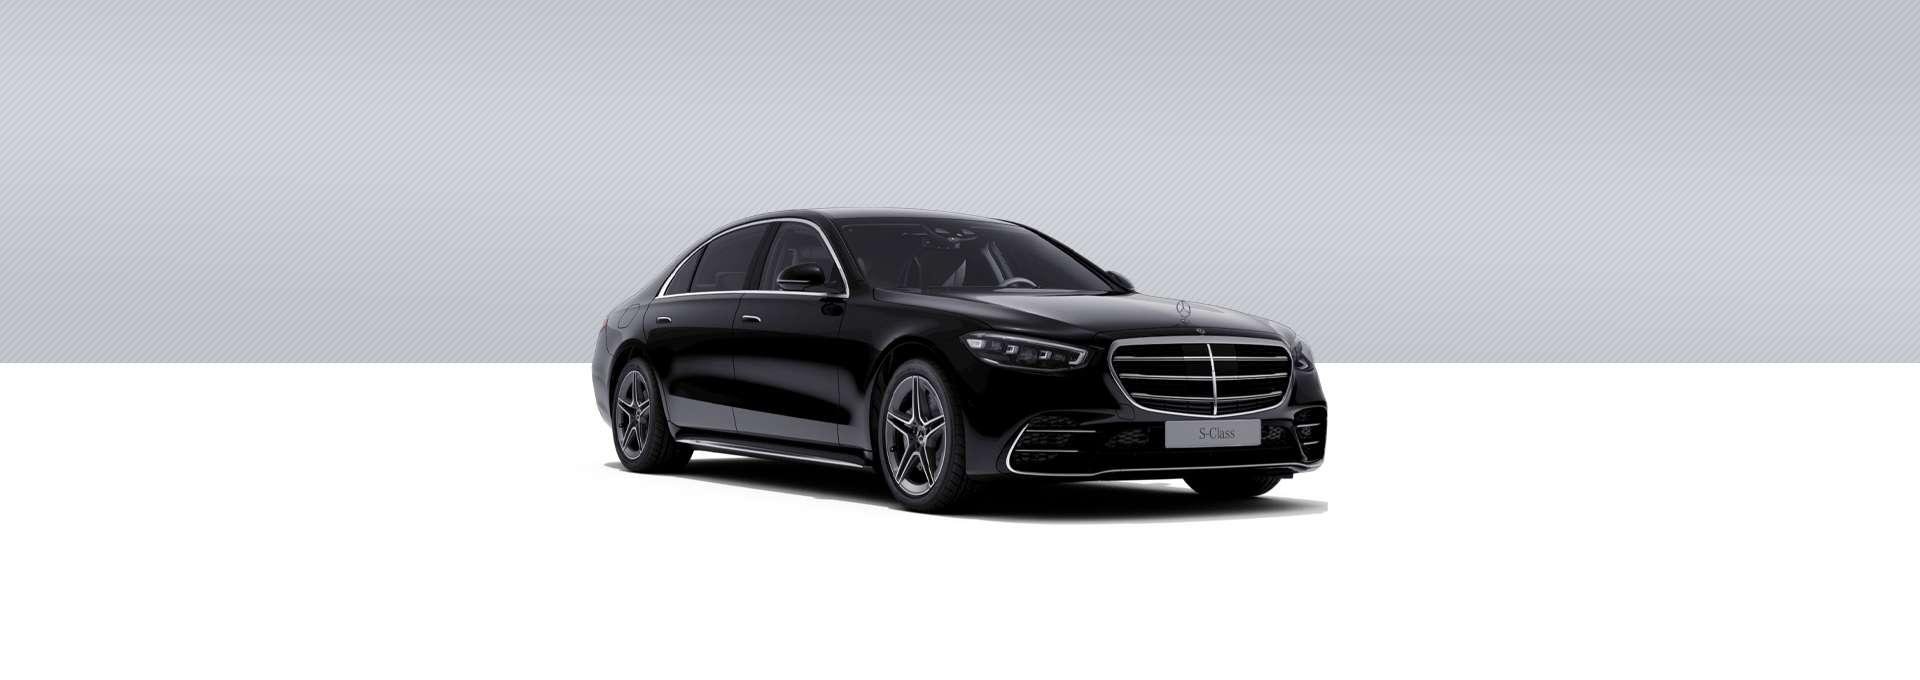 Mercedes Benz NUEVO CLASE S BERLINA LARGA